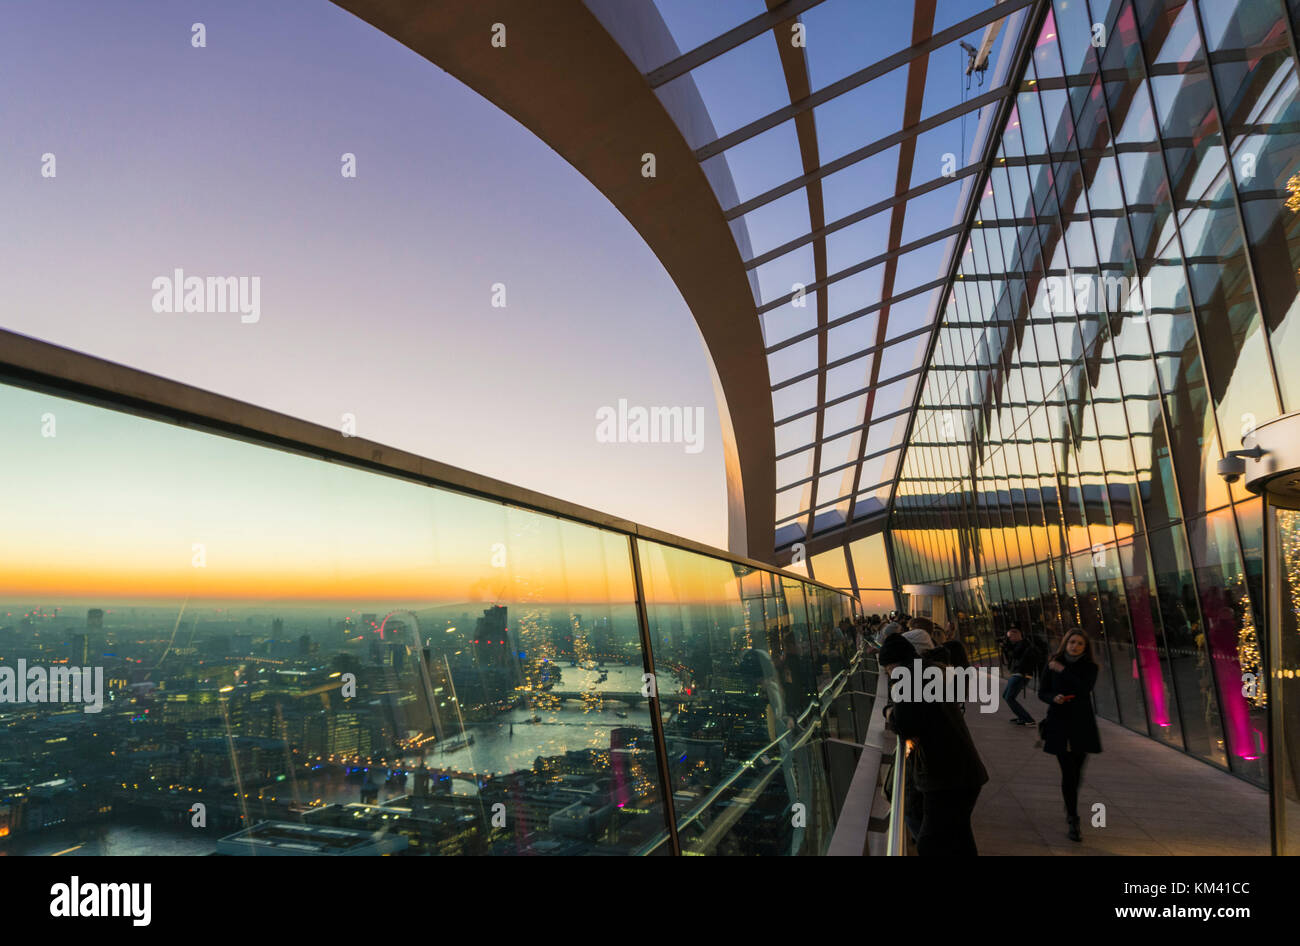 Inghilterra Londra Inghilterra city of London skyline tramonto il walkie talkie edificio grattacielo o 20 Fenchurch Immagini Stock